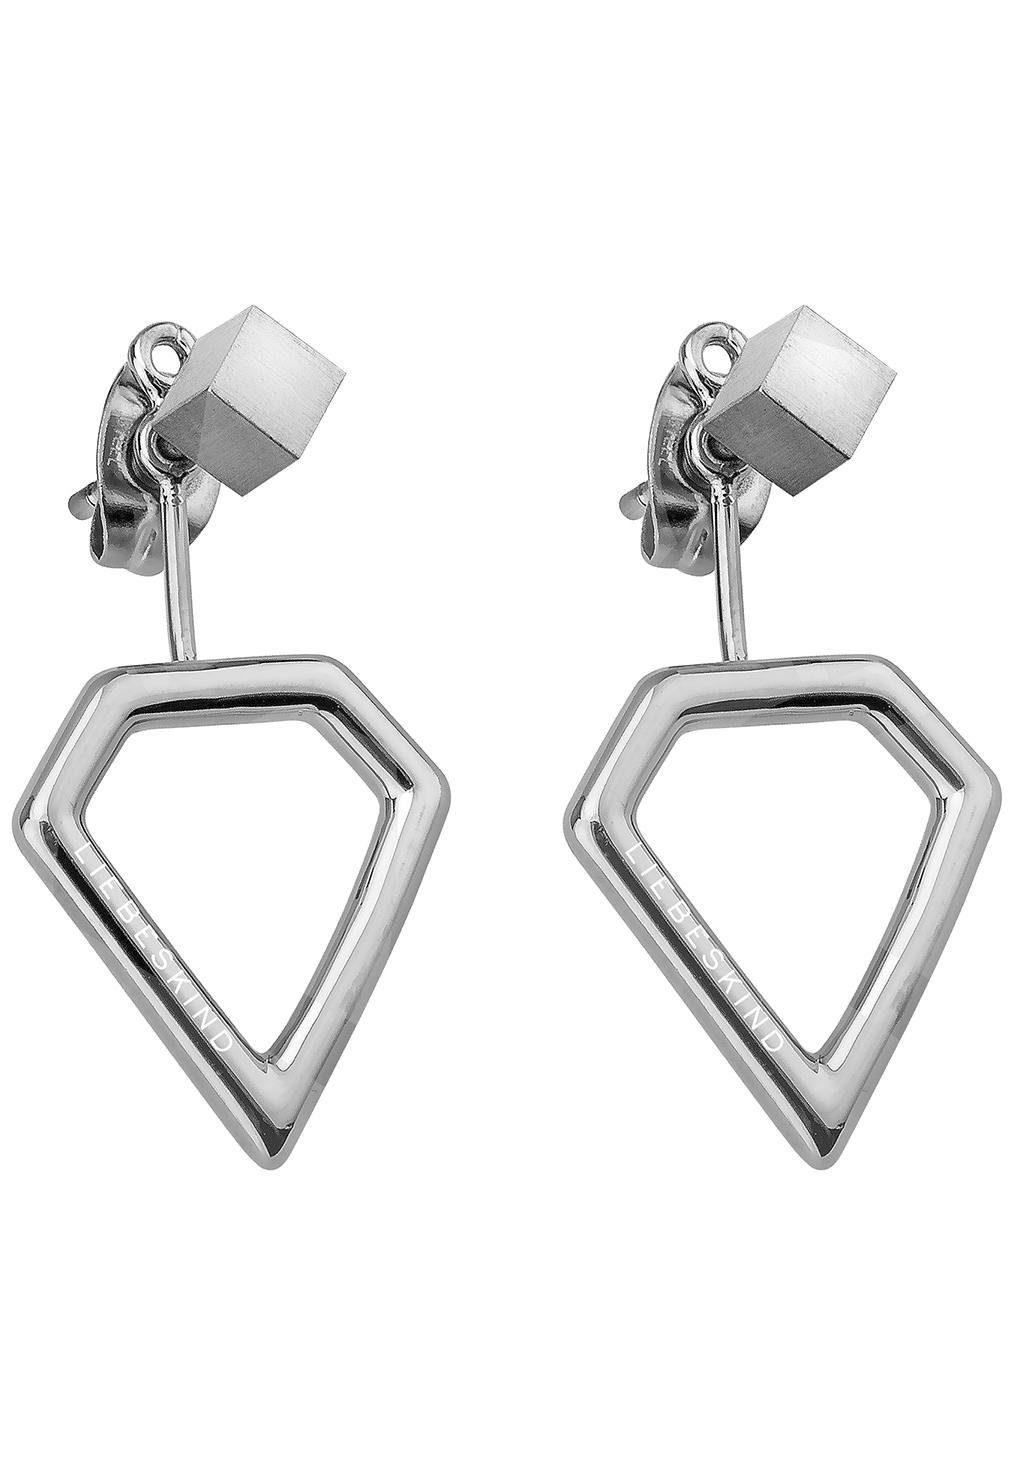 Liebeskind Paar Ohrstecker »LJ-0043-E-16« mit abnehmbaren Einhängern